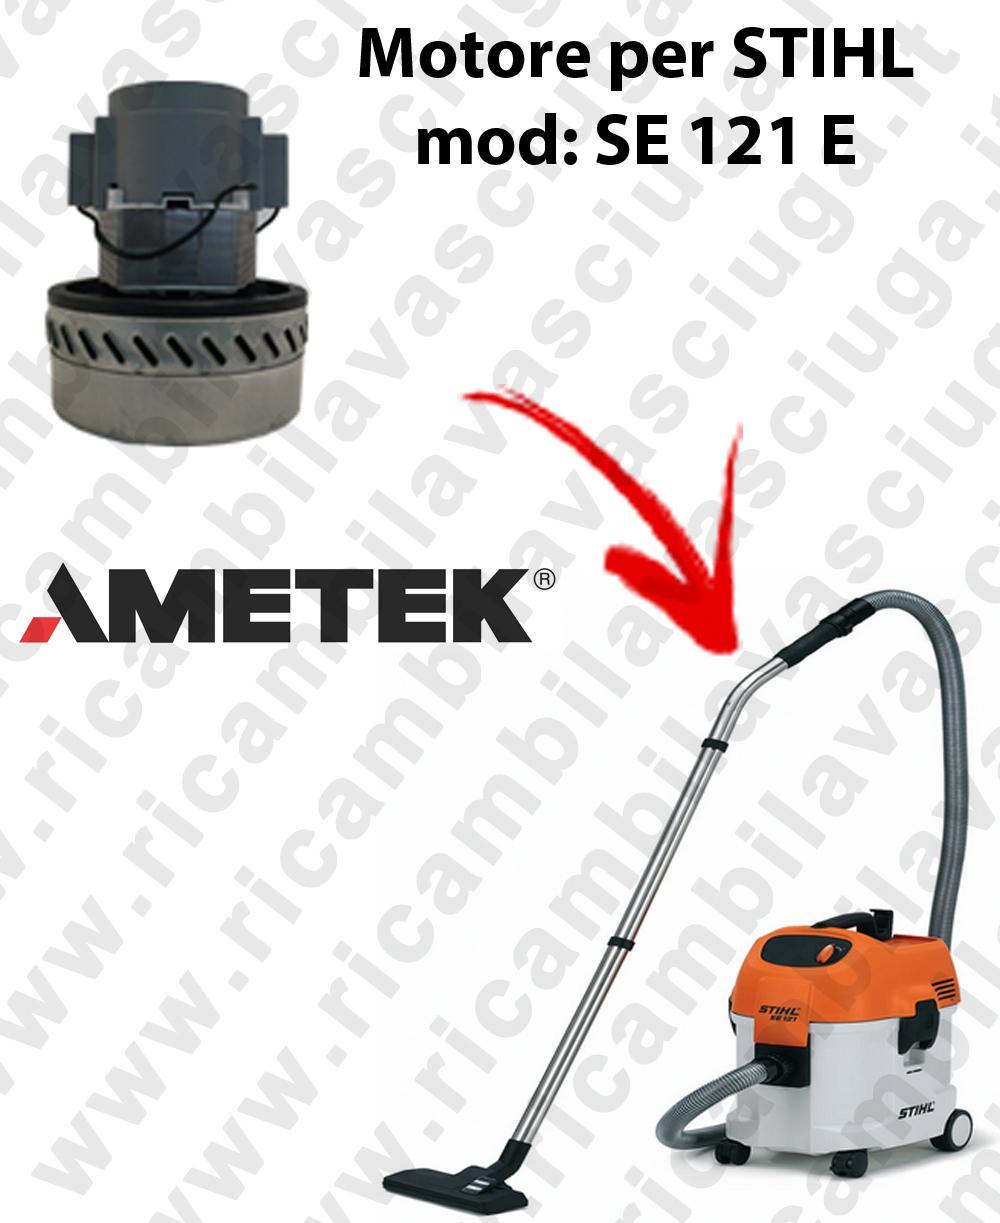 Motore aspirazione AMETEK per aspirapolvere SE 121 E - STIHL